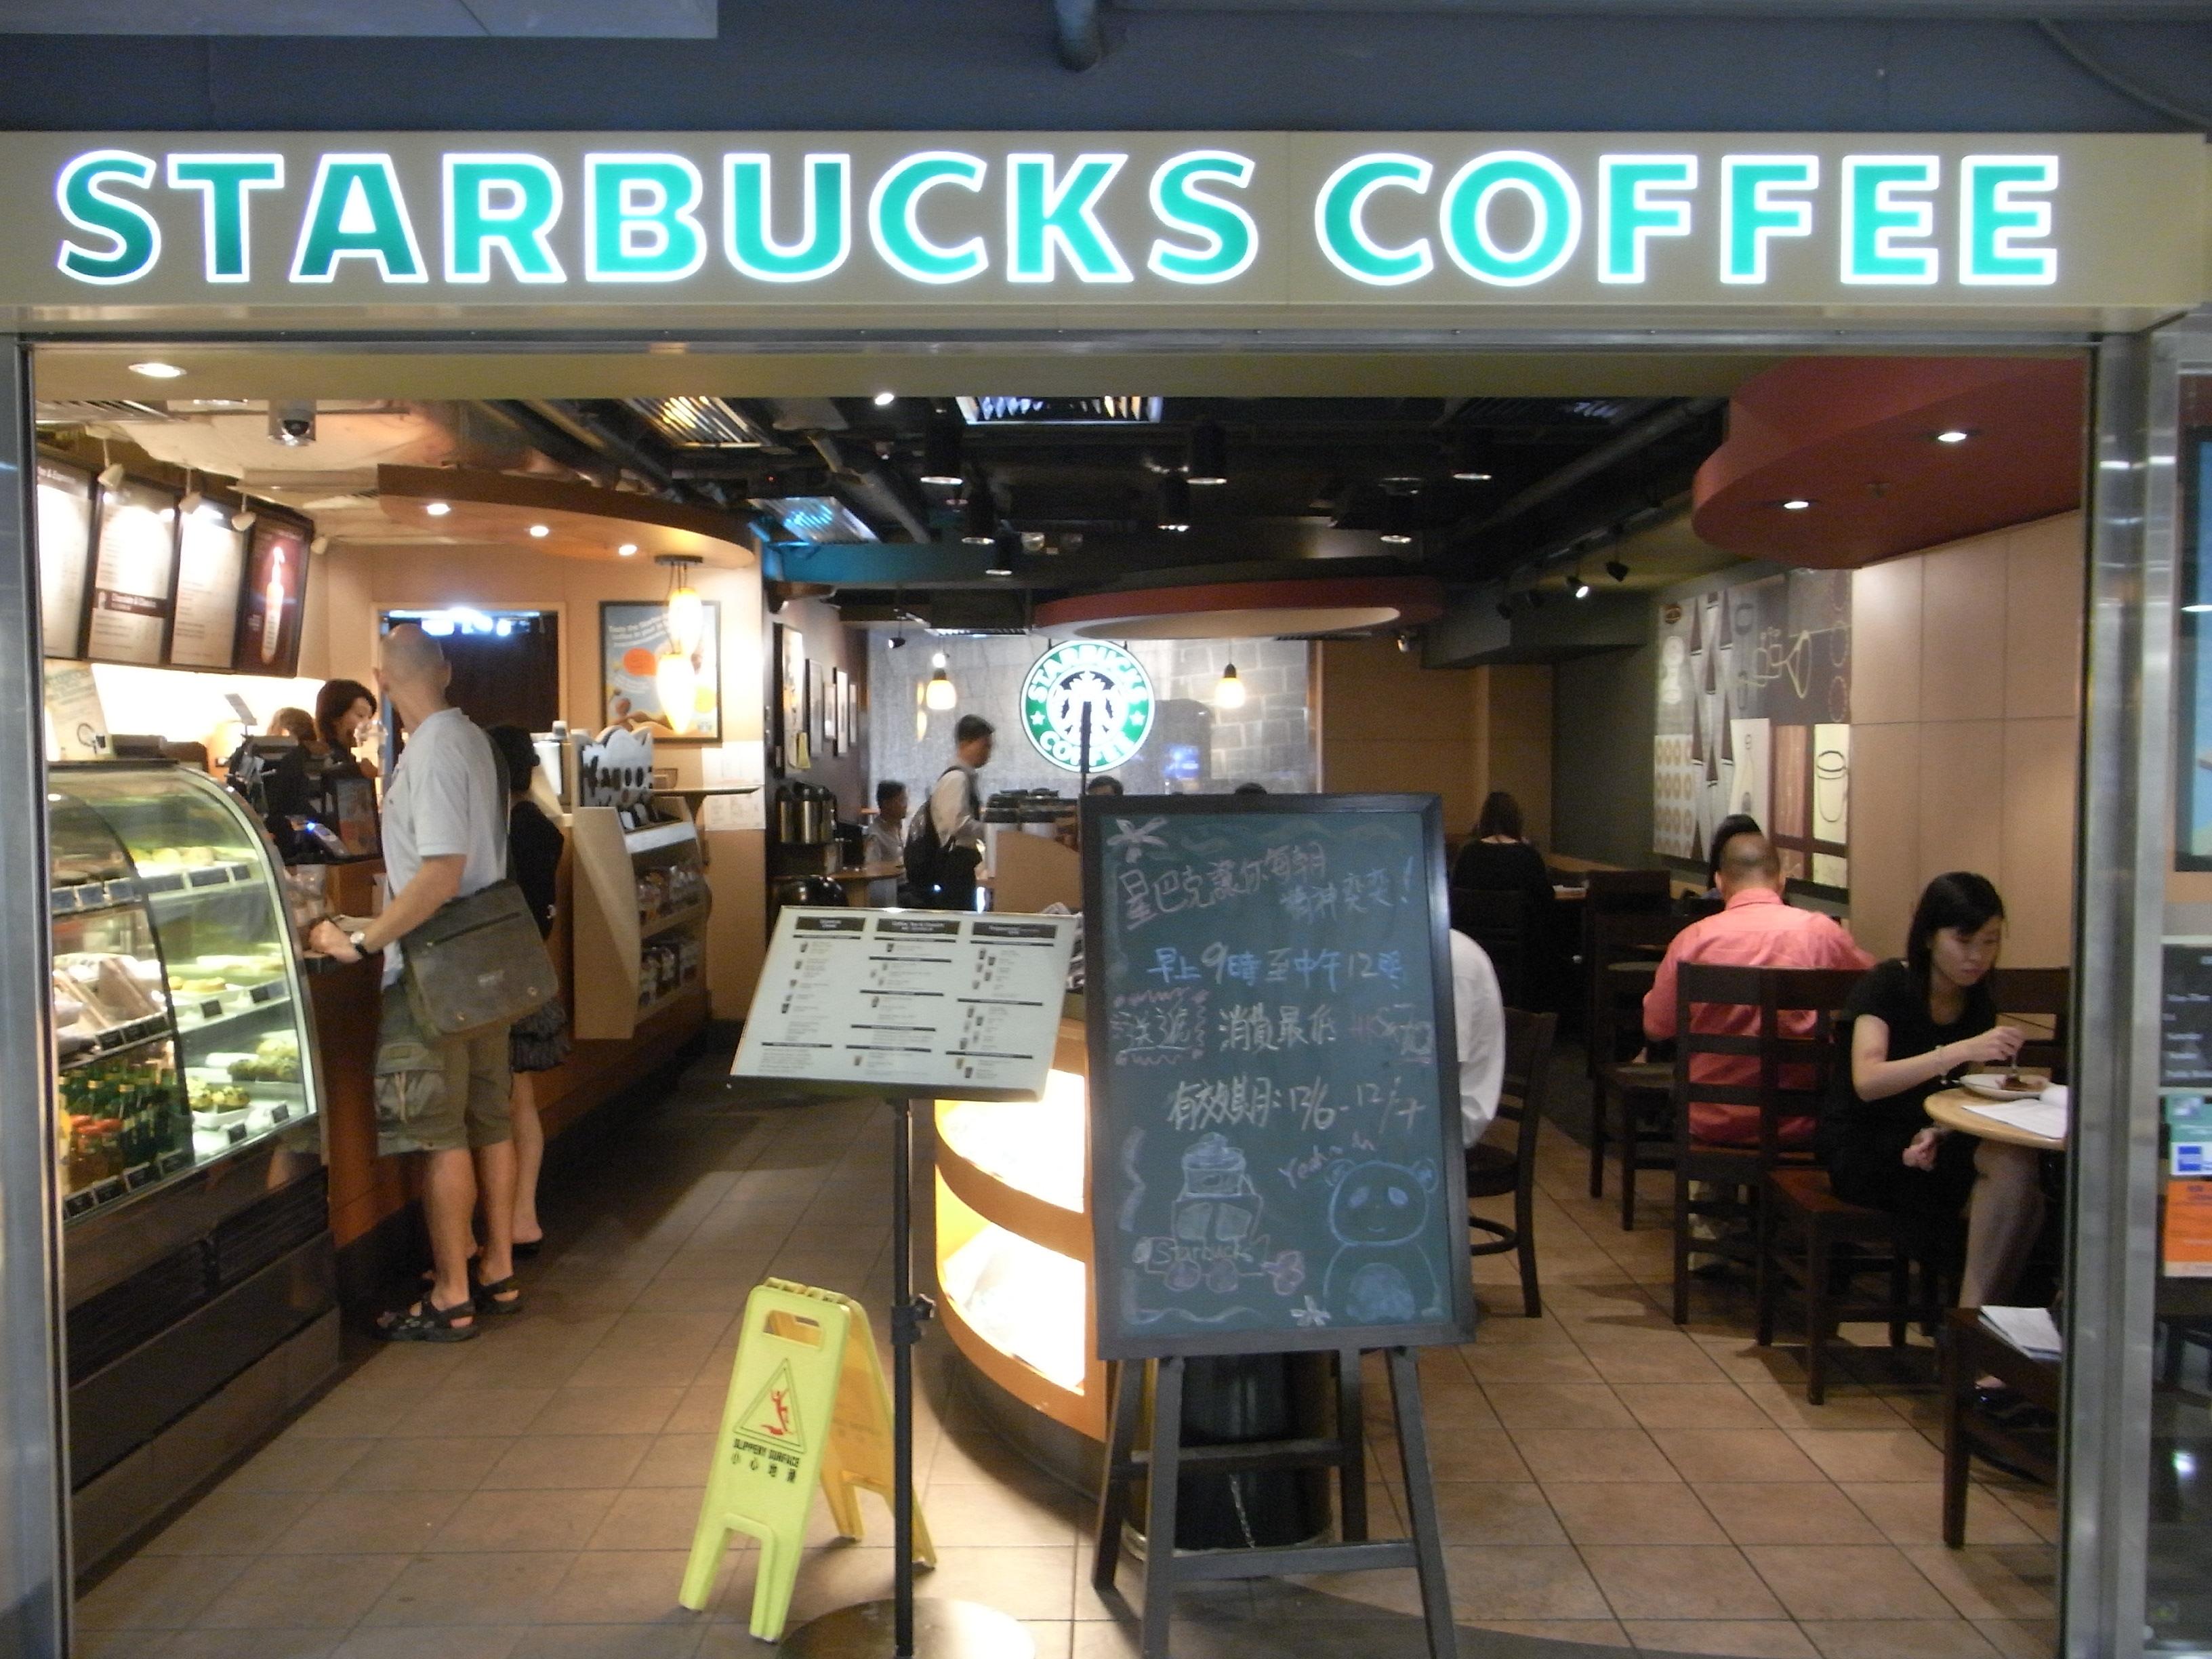 FileHK Mongkok Grand Tower Mall Interior Starbucks Coffee ShopJPG